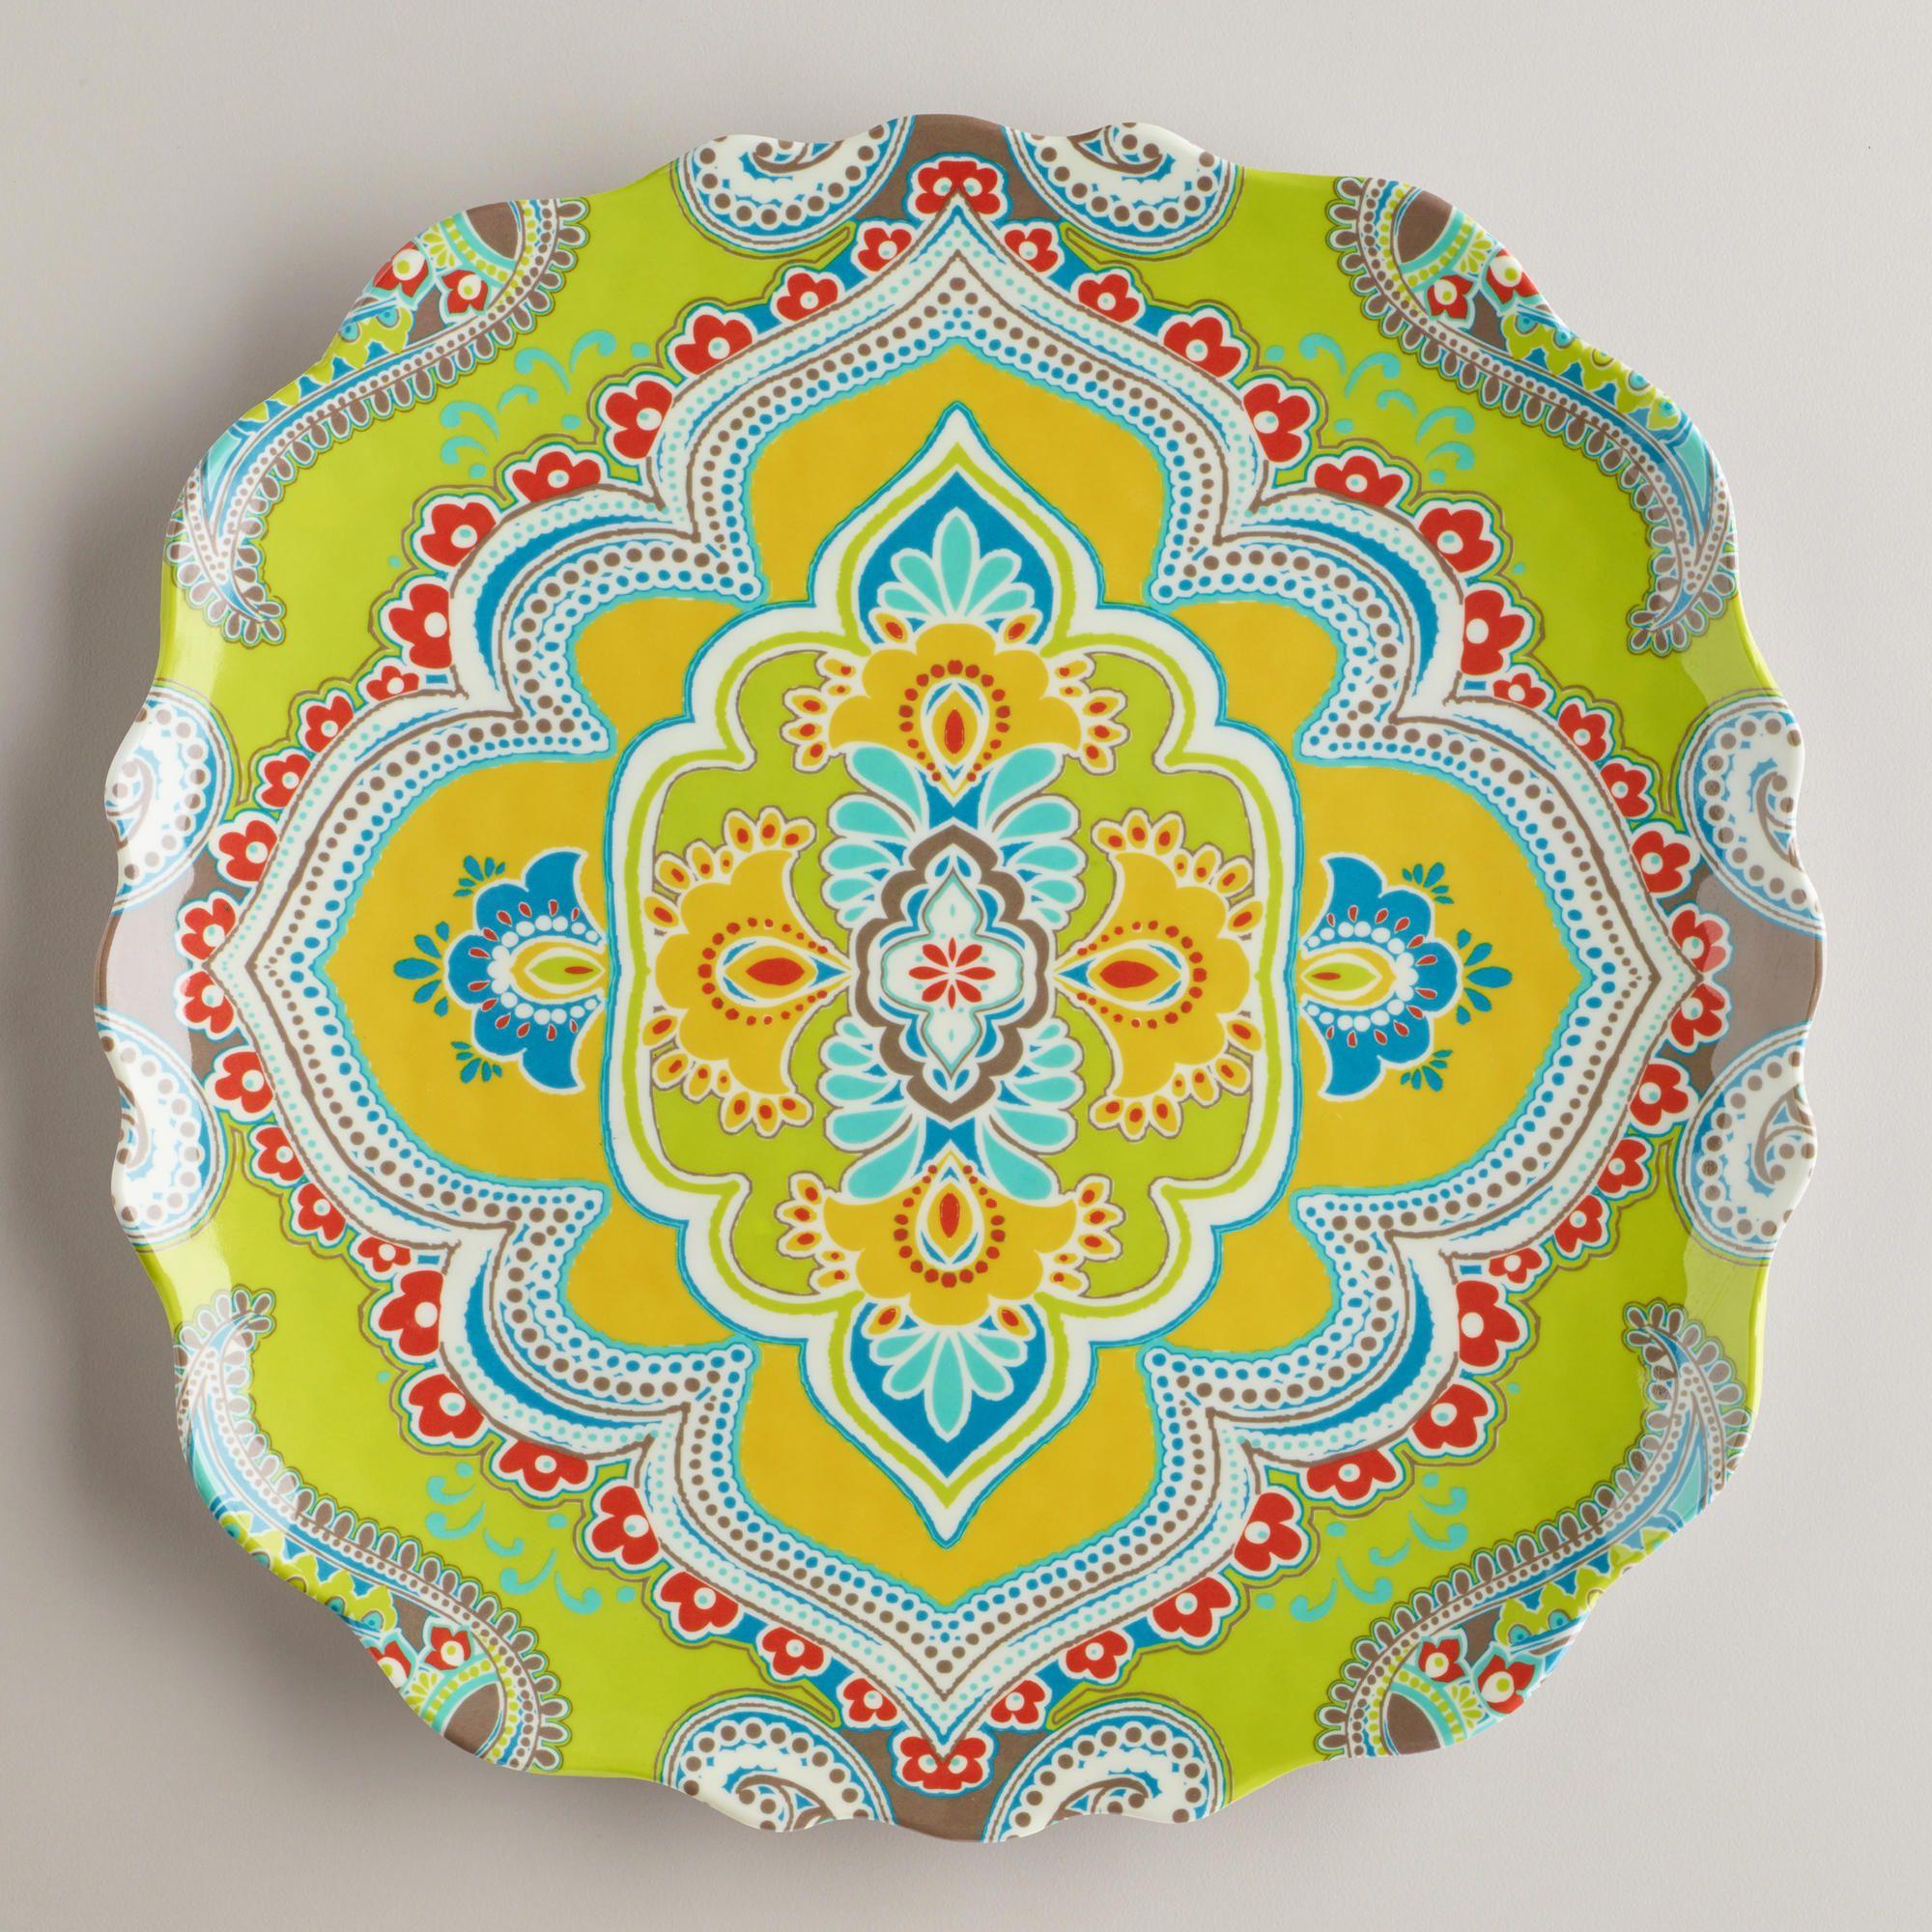 Green Paisley Antigua Plates, Set of 2 | World Market | Ceramics and ...